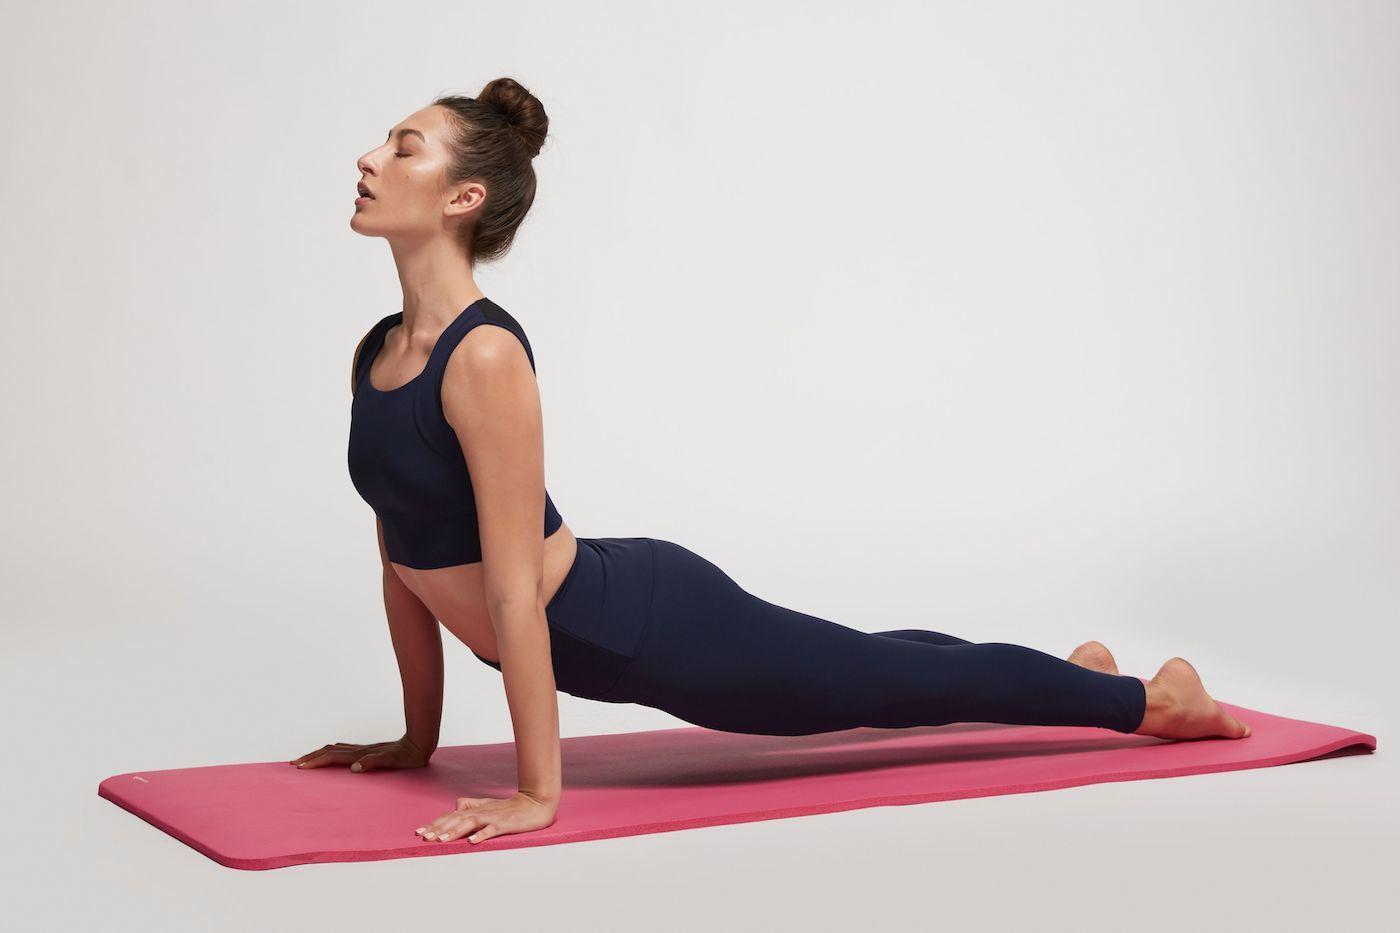 posture correcting activewear